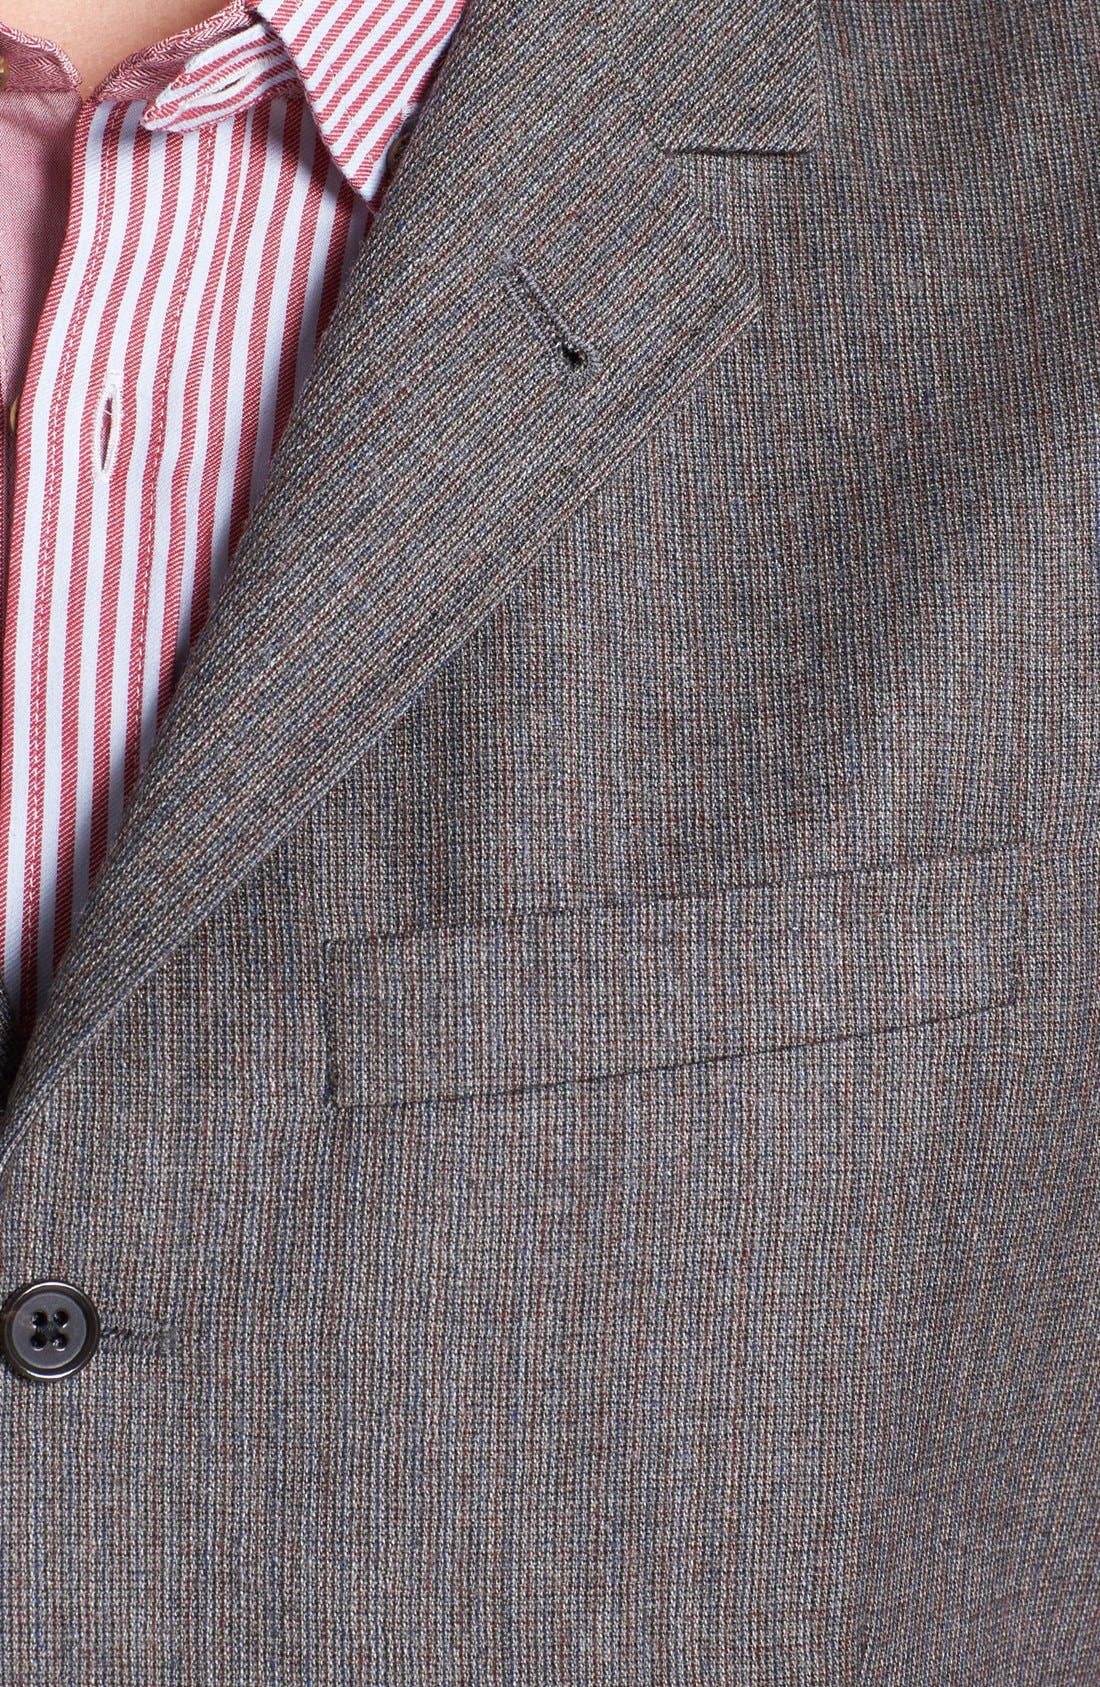 Alternate Image 2  - Ted Baker London Wool Vest